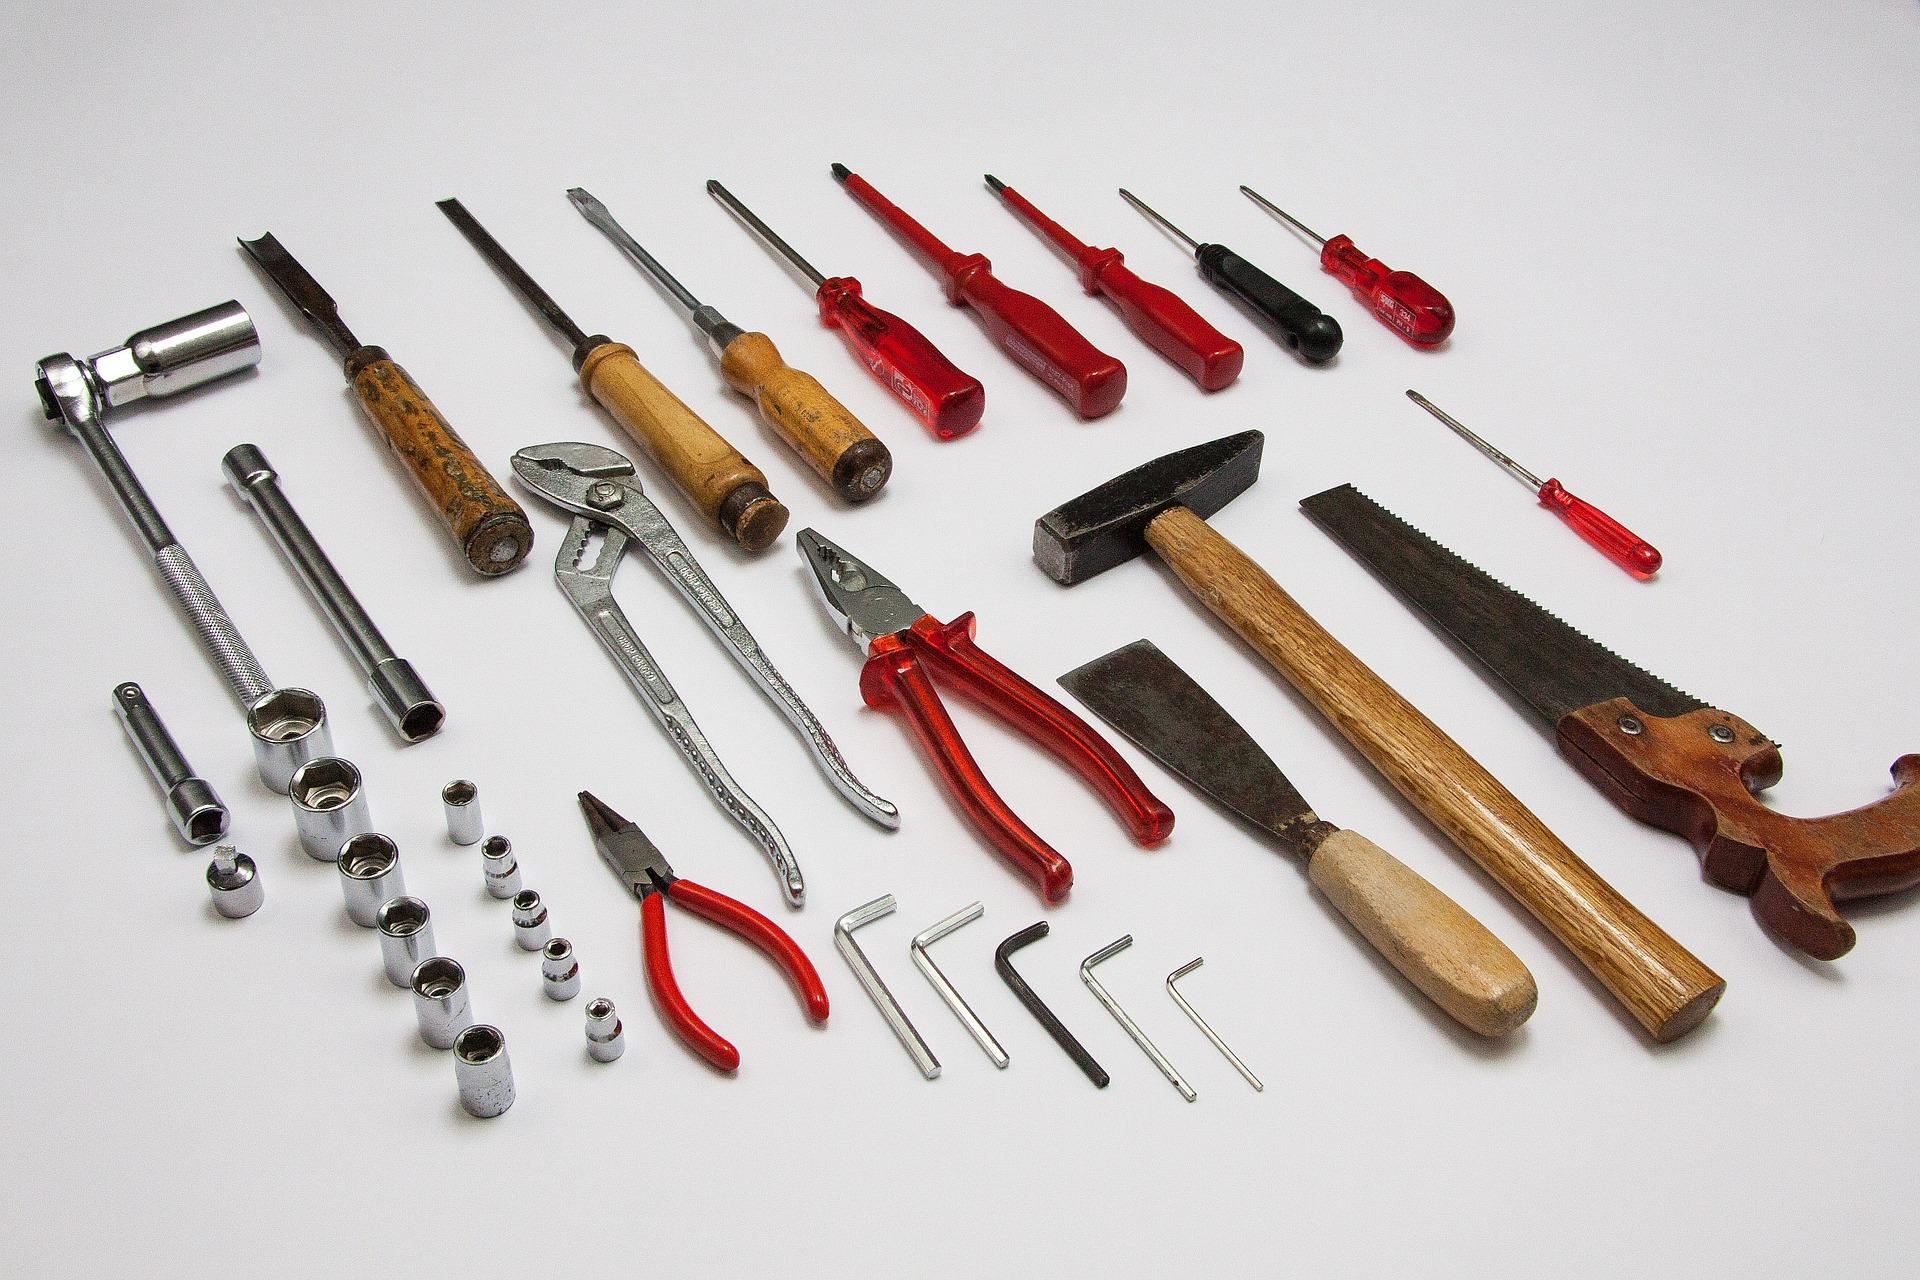 tool-379595_1920.jpg